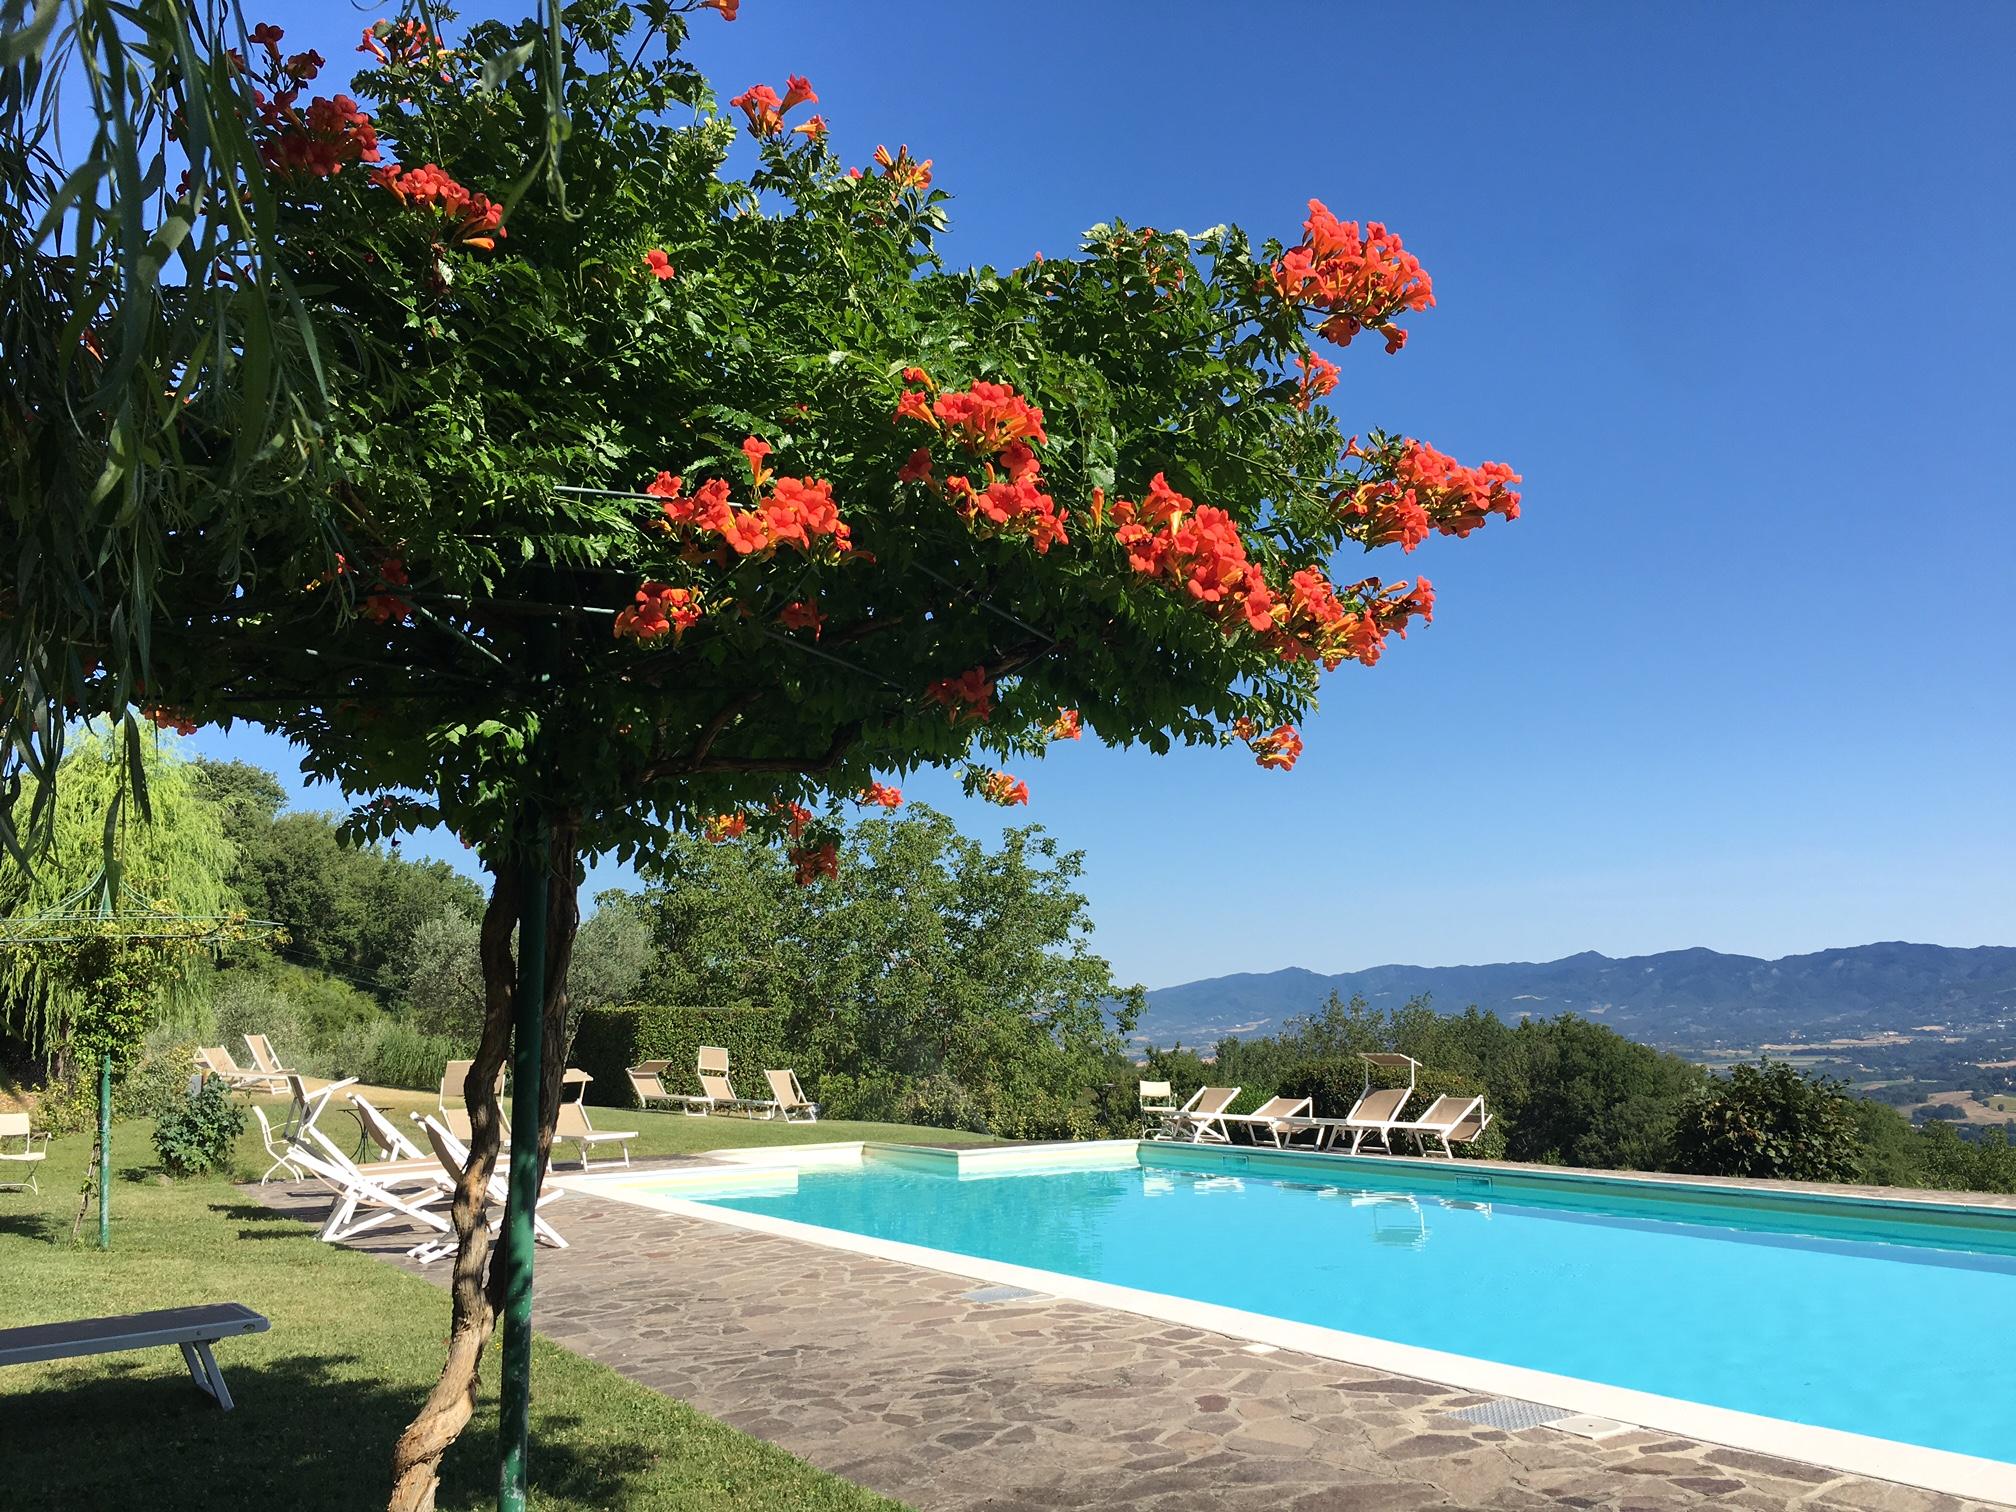 Resort per Famiglie in Toscana a Villa Campestri Olive Oil Resort